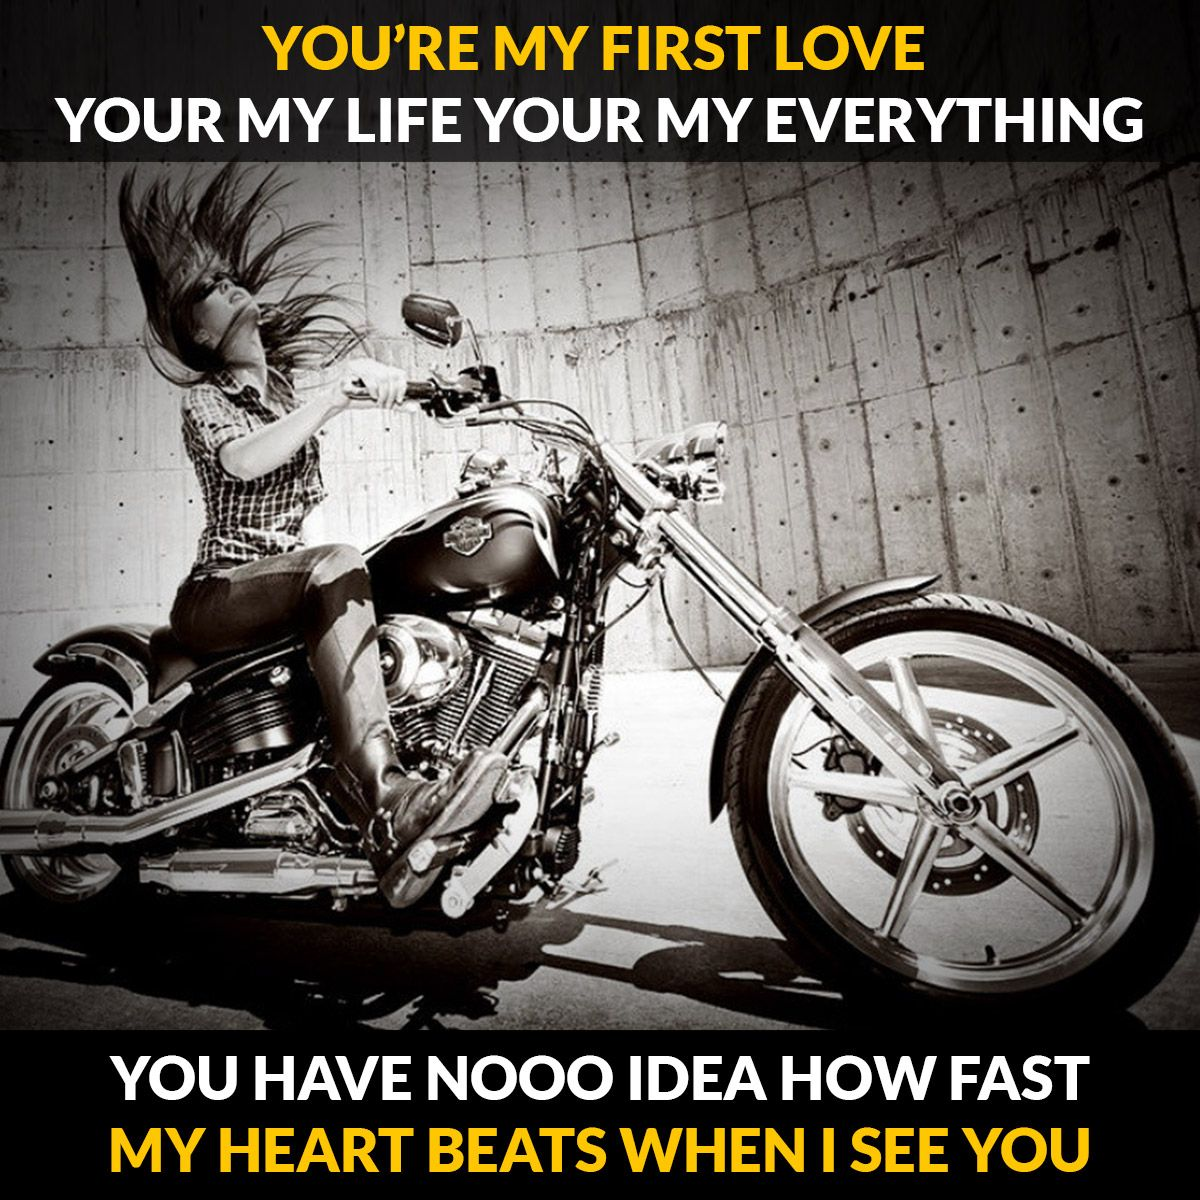 Bike Lover Harley Davidson Knucklehead Harley Davidson Dyna